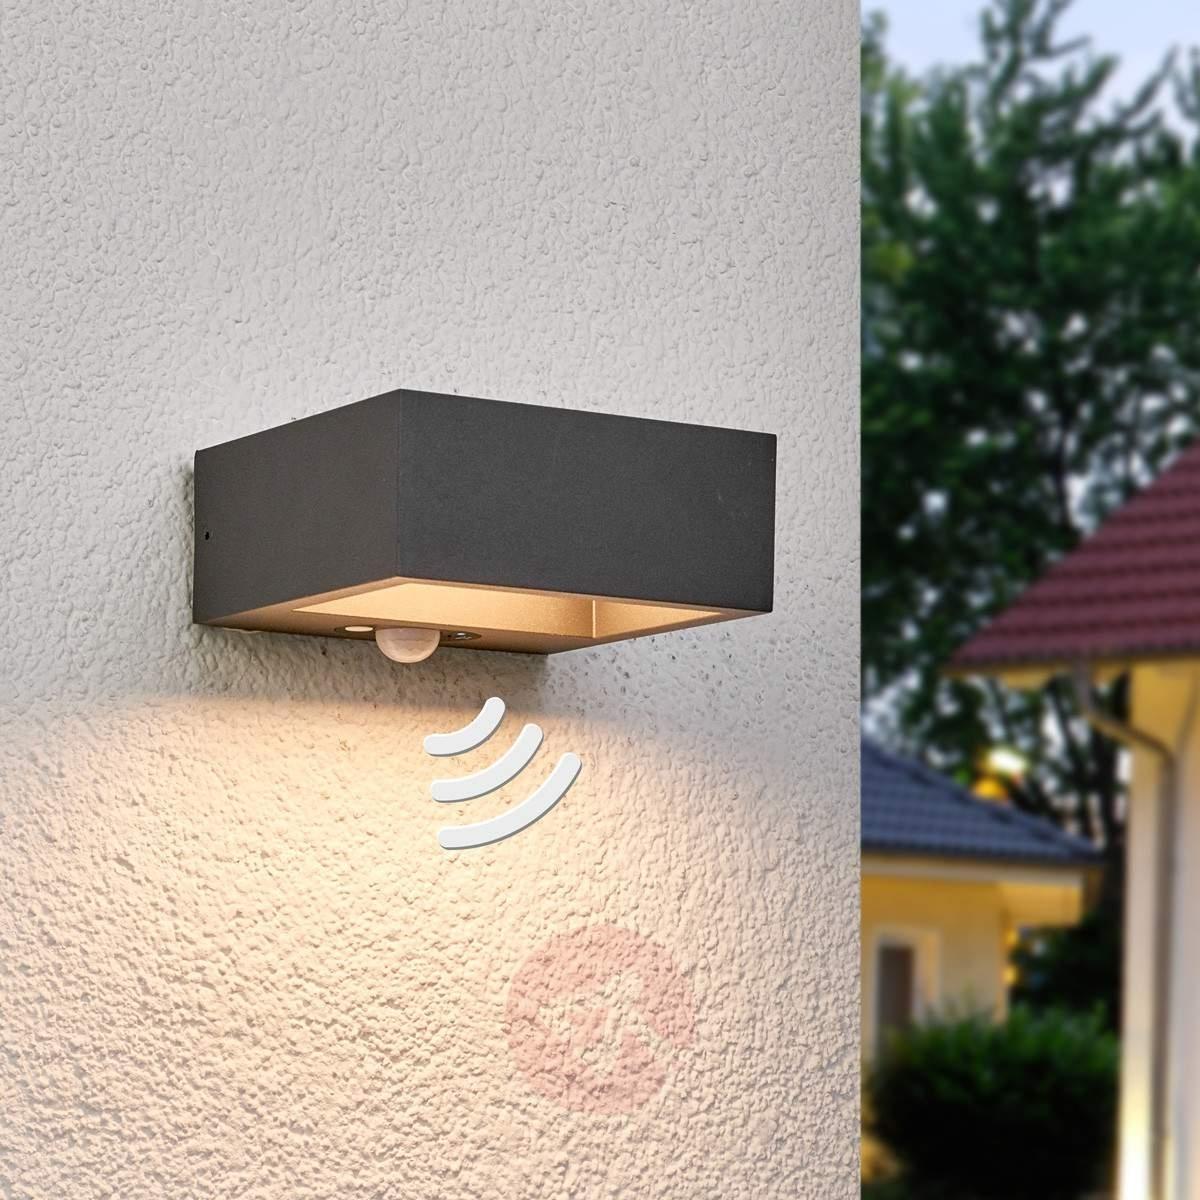 Modern Small Outdoor Solar Lights Inside Recent Solar Powered Led Outdoor Wall Light Mahra, Sensor (View 10 of 20)